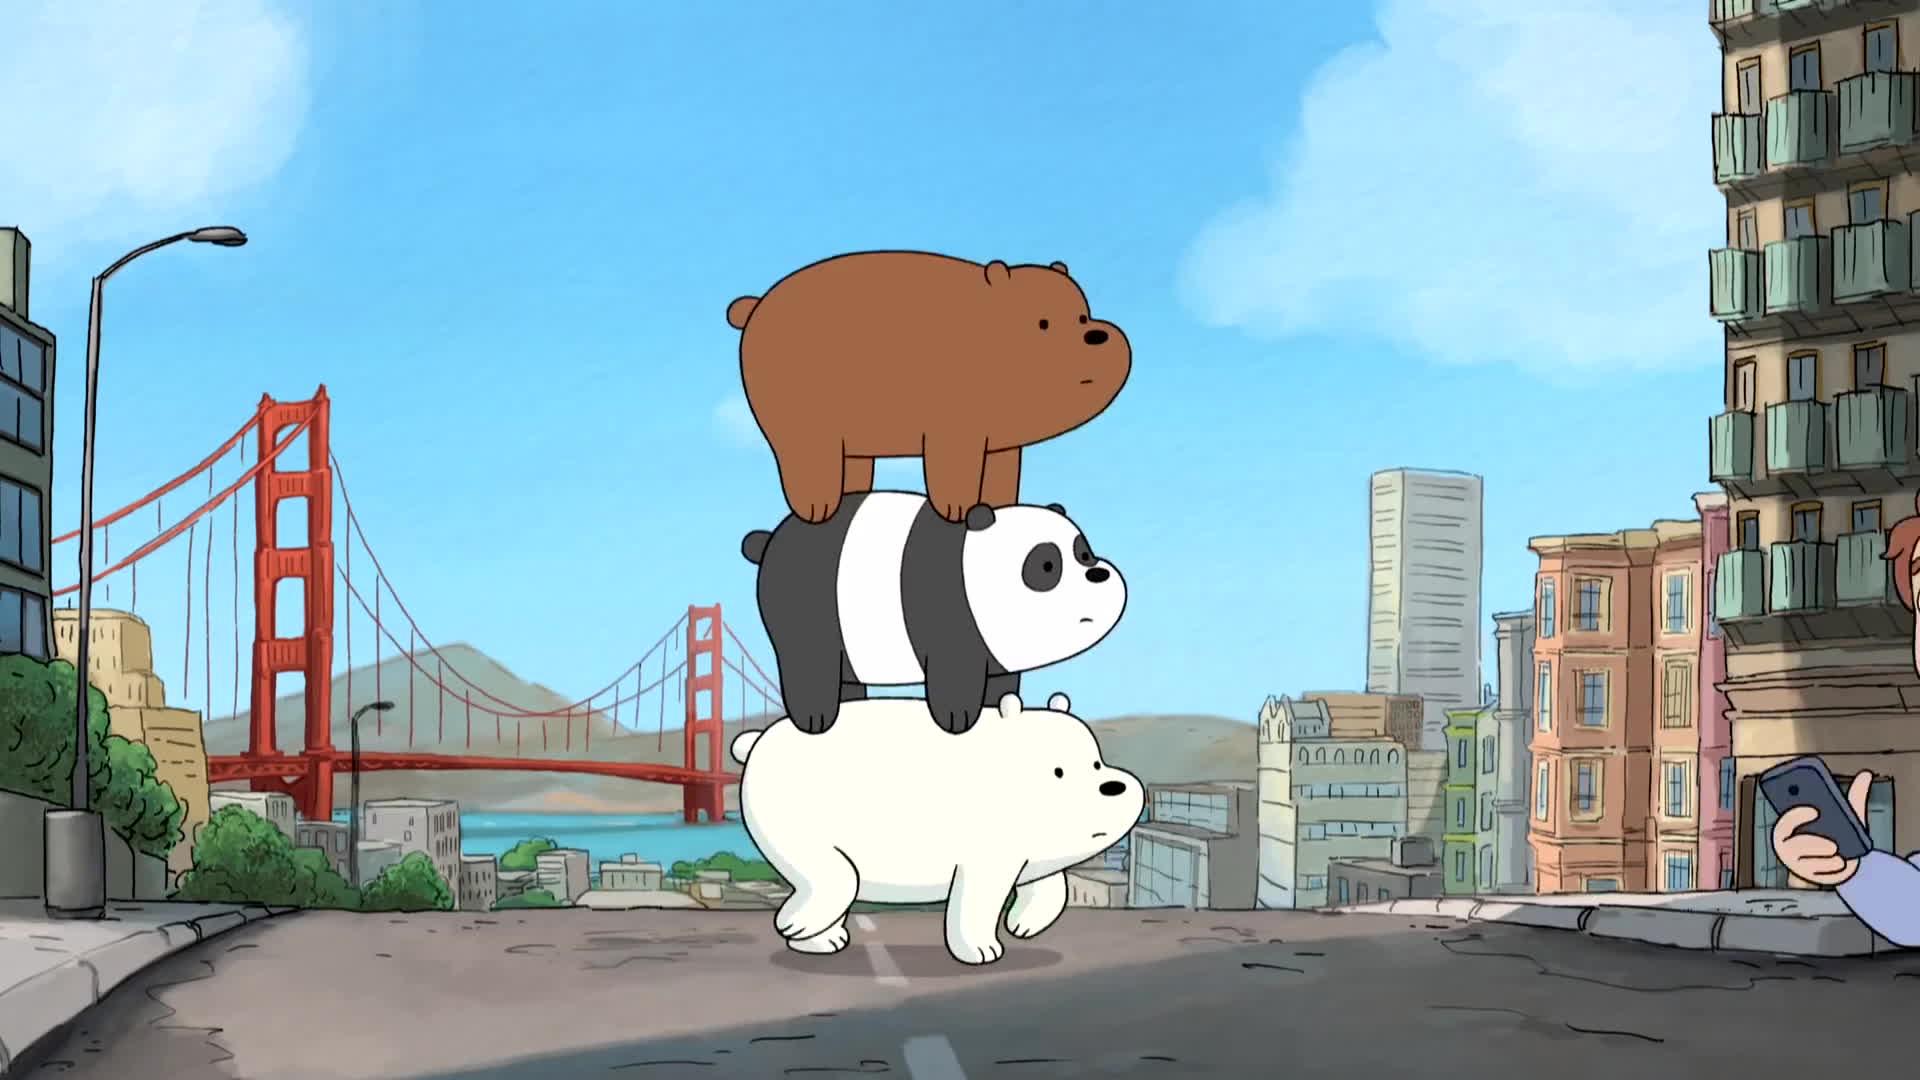 we bare bears, we bare bears - intro, we bare bears opening, We Bare Bears - Intro GIFs